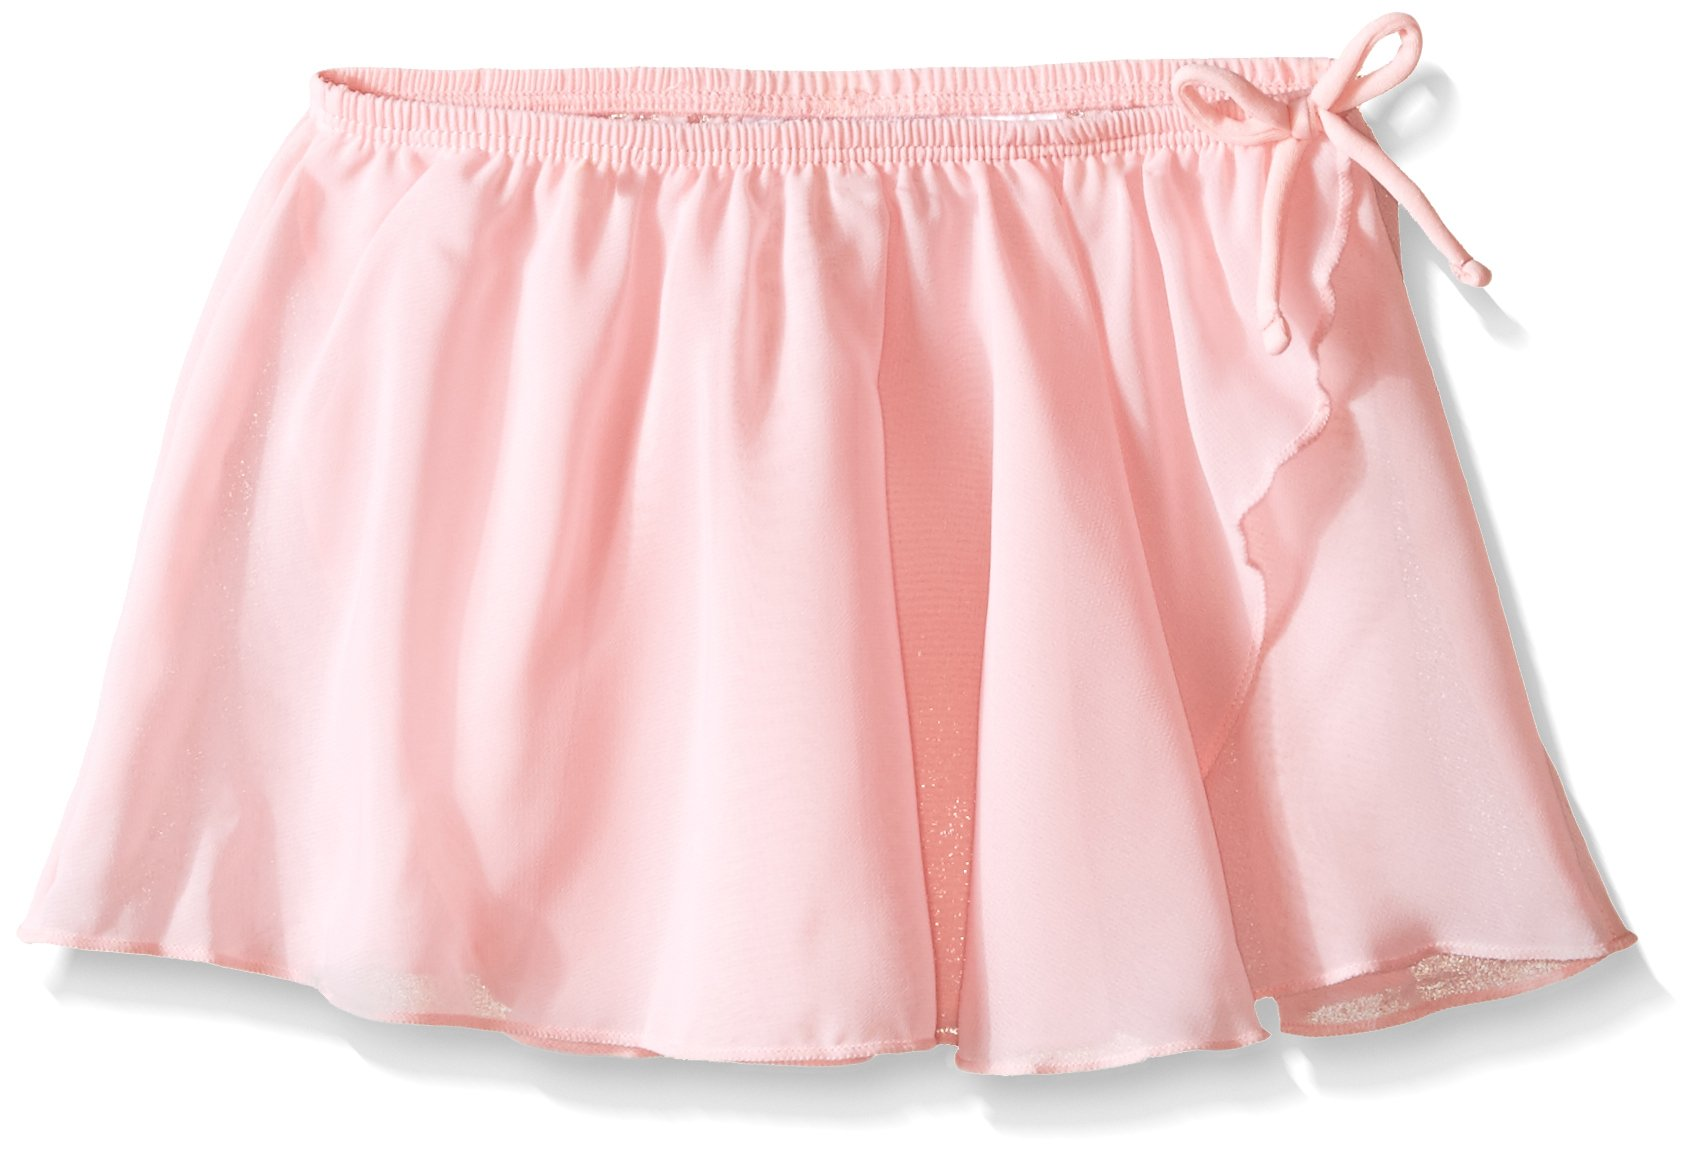 Jacques Moret Little Girls Dance Basic Wrap Skirt, Pink, X-Small(4-5)